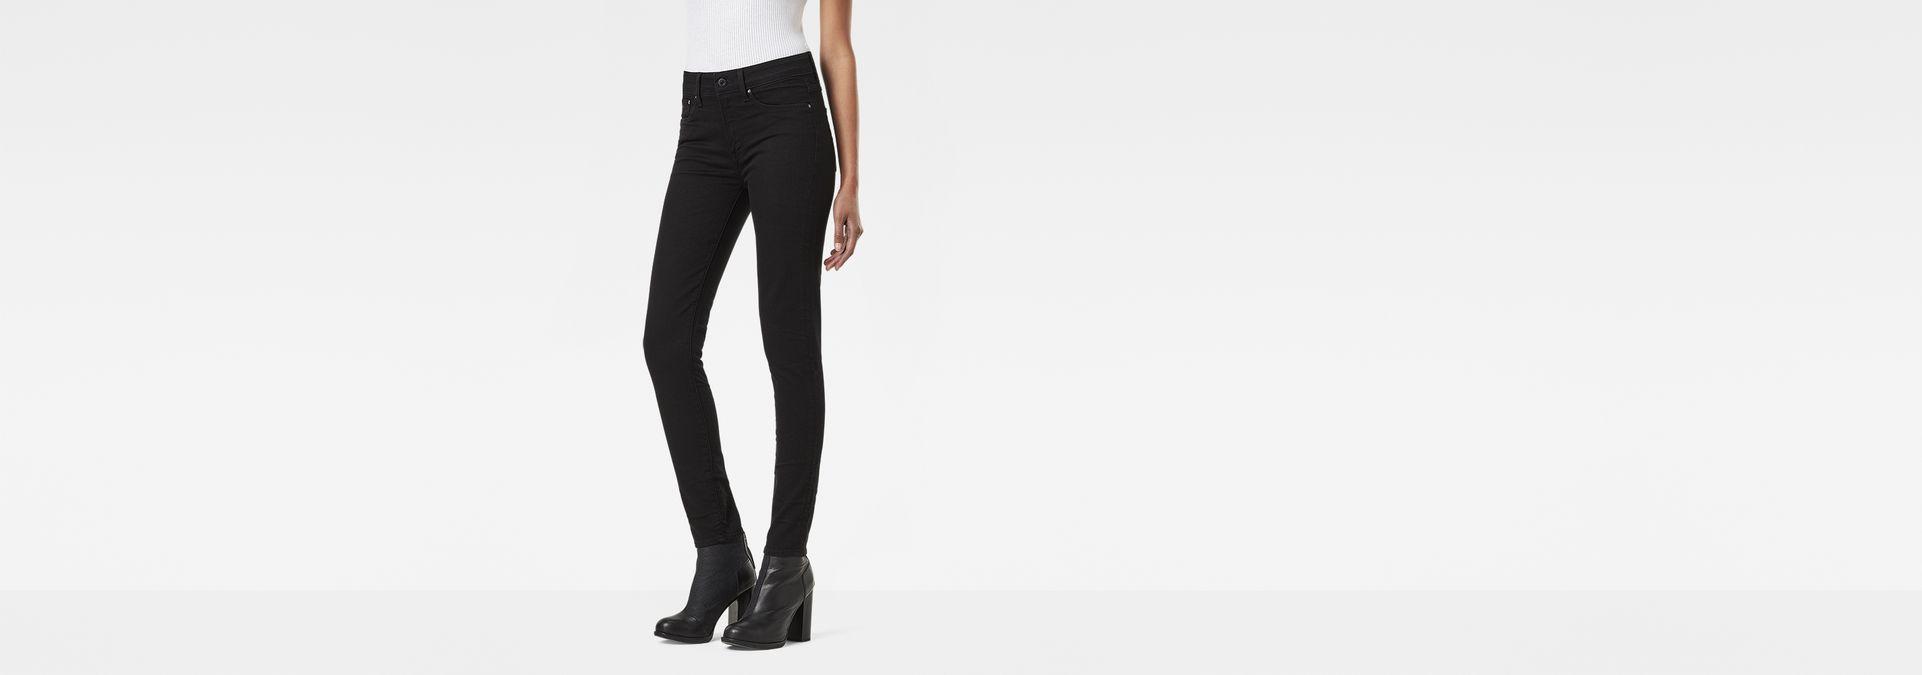 10311a2753f 3301 Ultra High Super Skinny Jeans   dk aged   G-Star RAW®